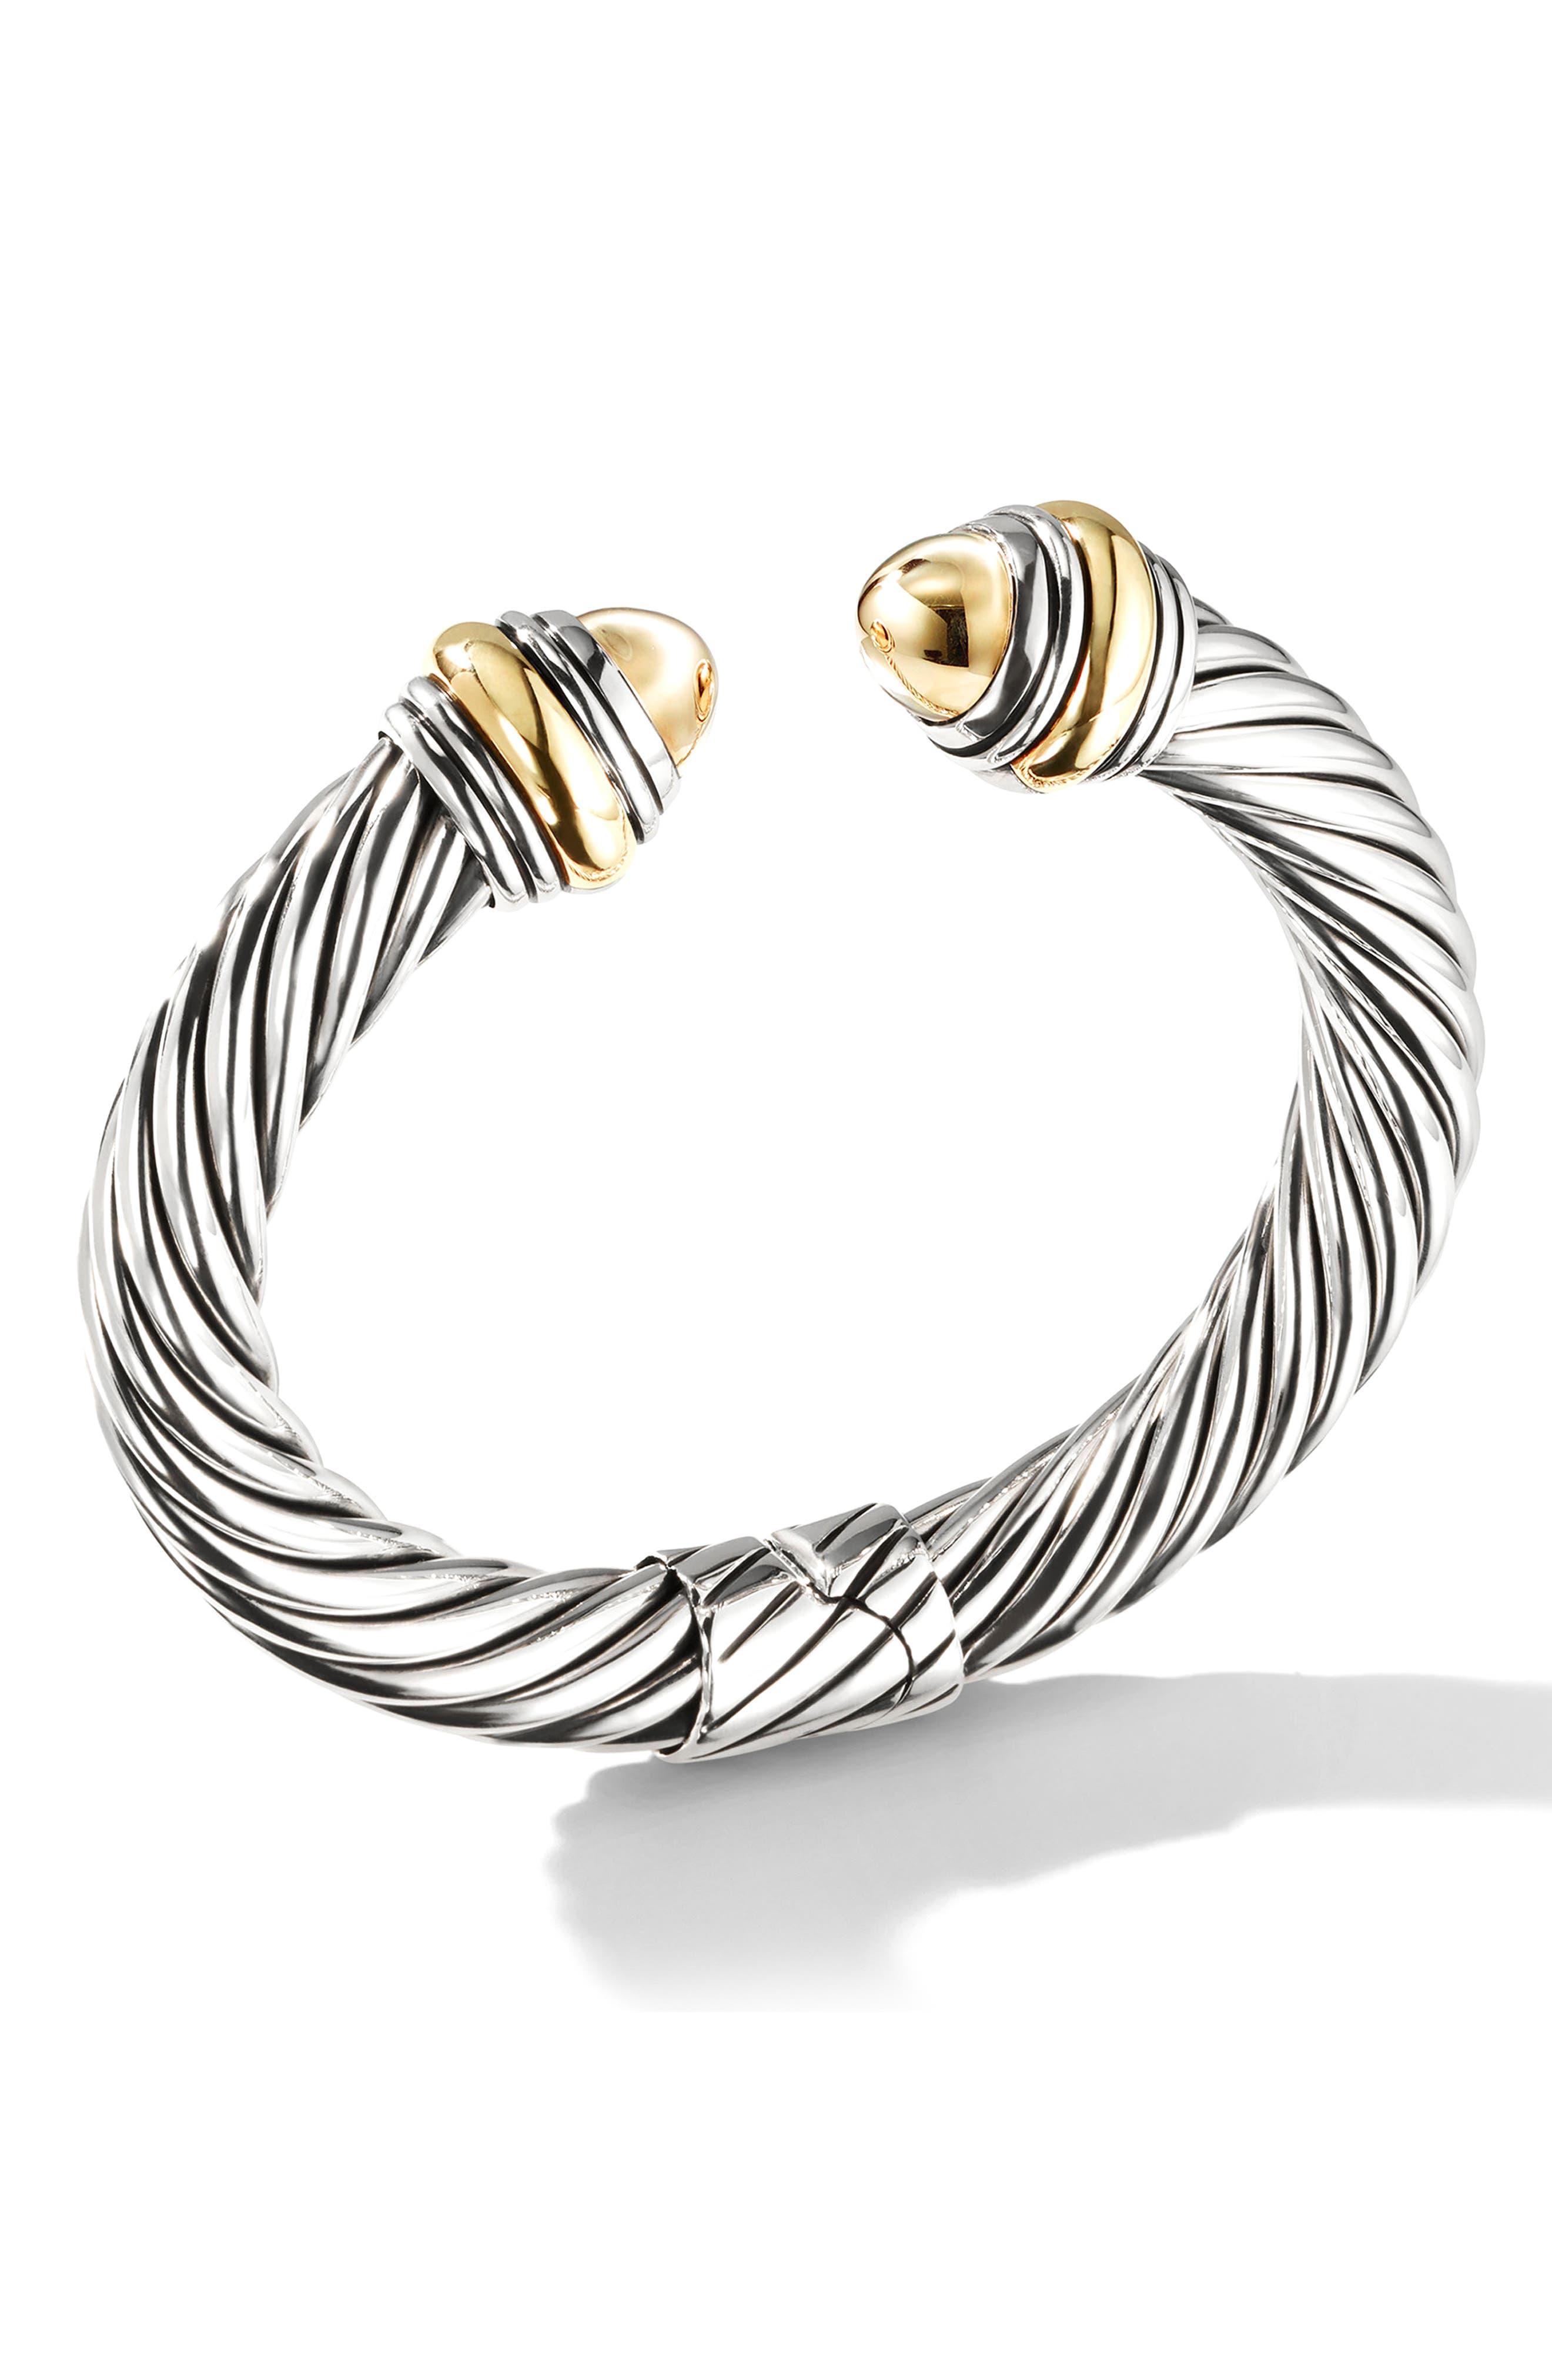 Cable Classics Bracelet,                             Alternate thumbnail 2, color,                             GOLD/ SILVER/ GOLD DOME